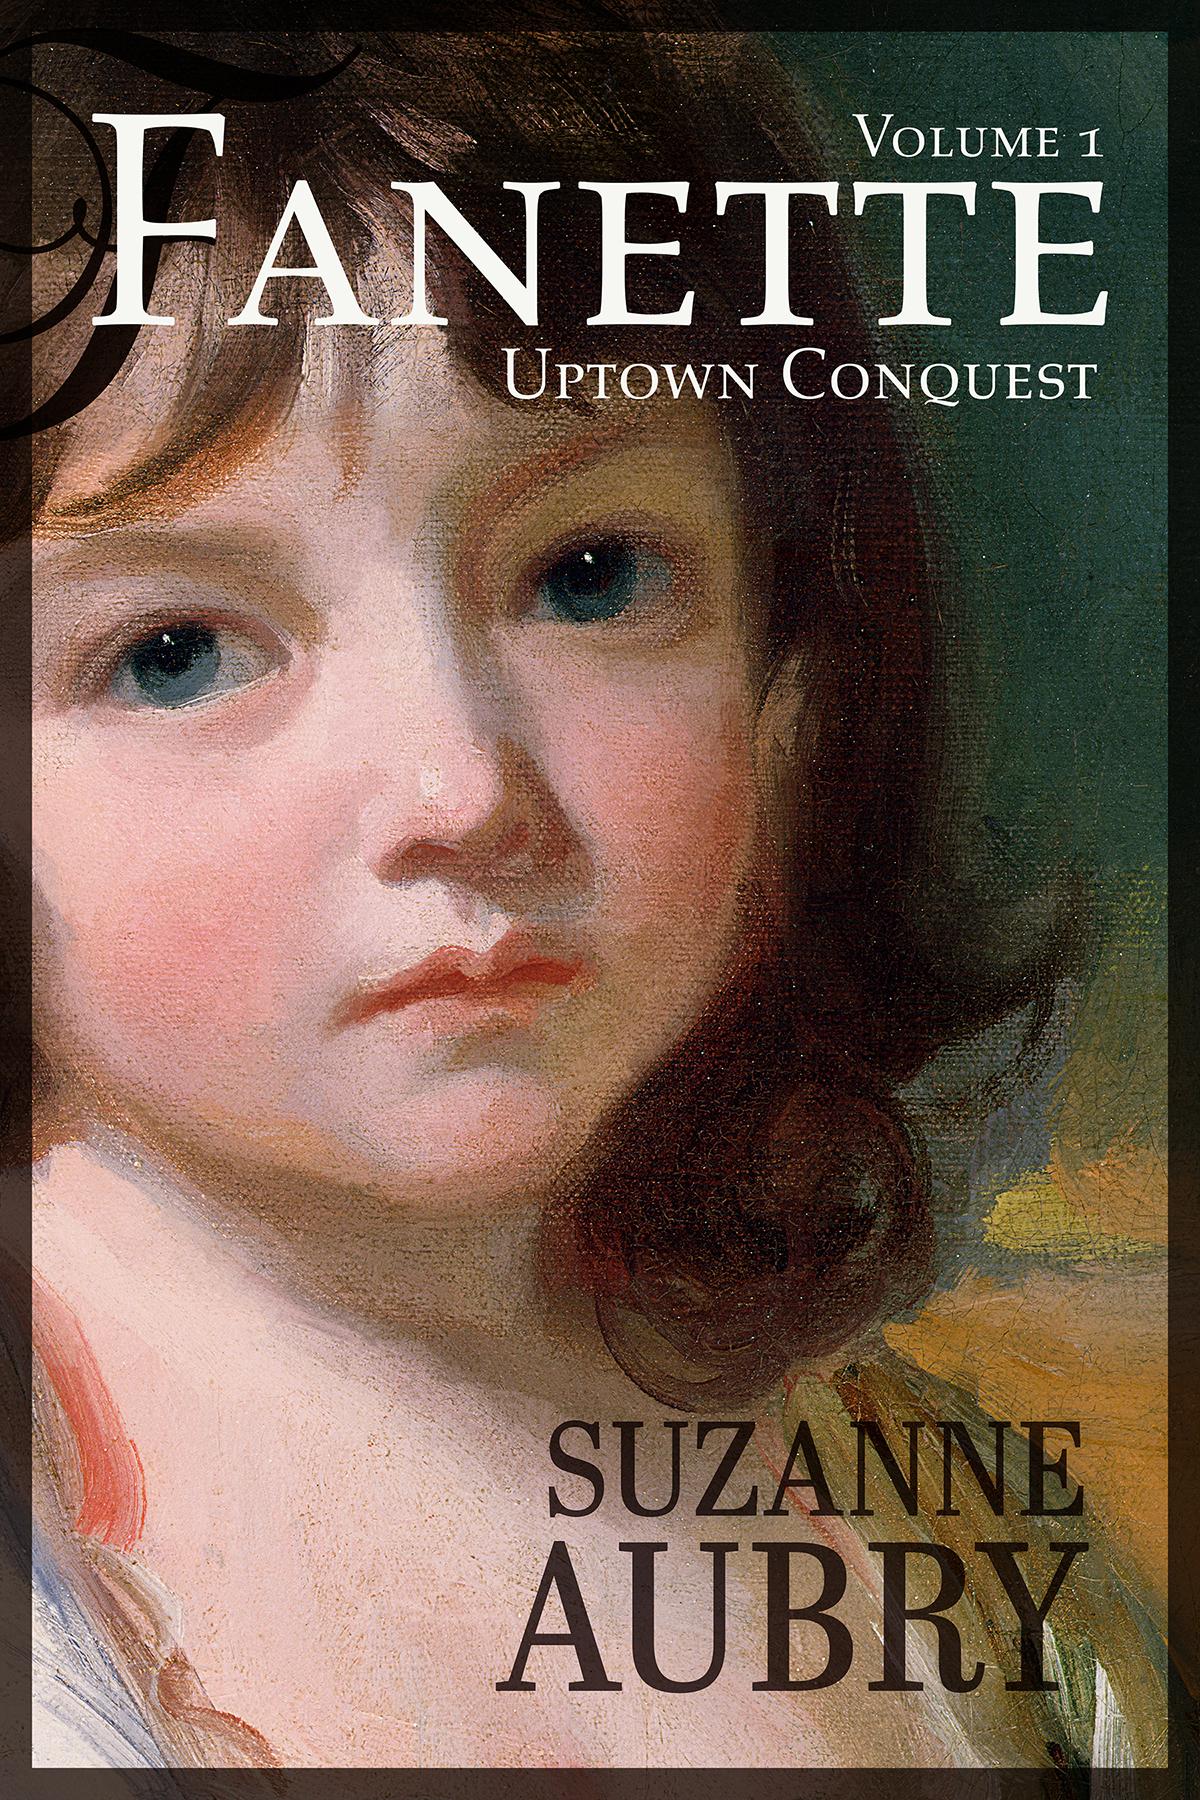 Couverture : Fanette, Volume 1 Suzanne Aubry